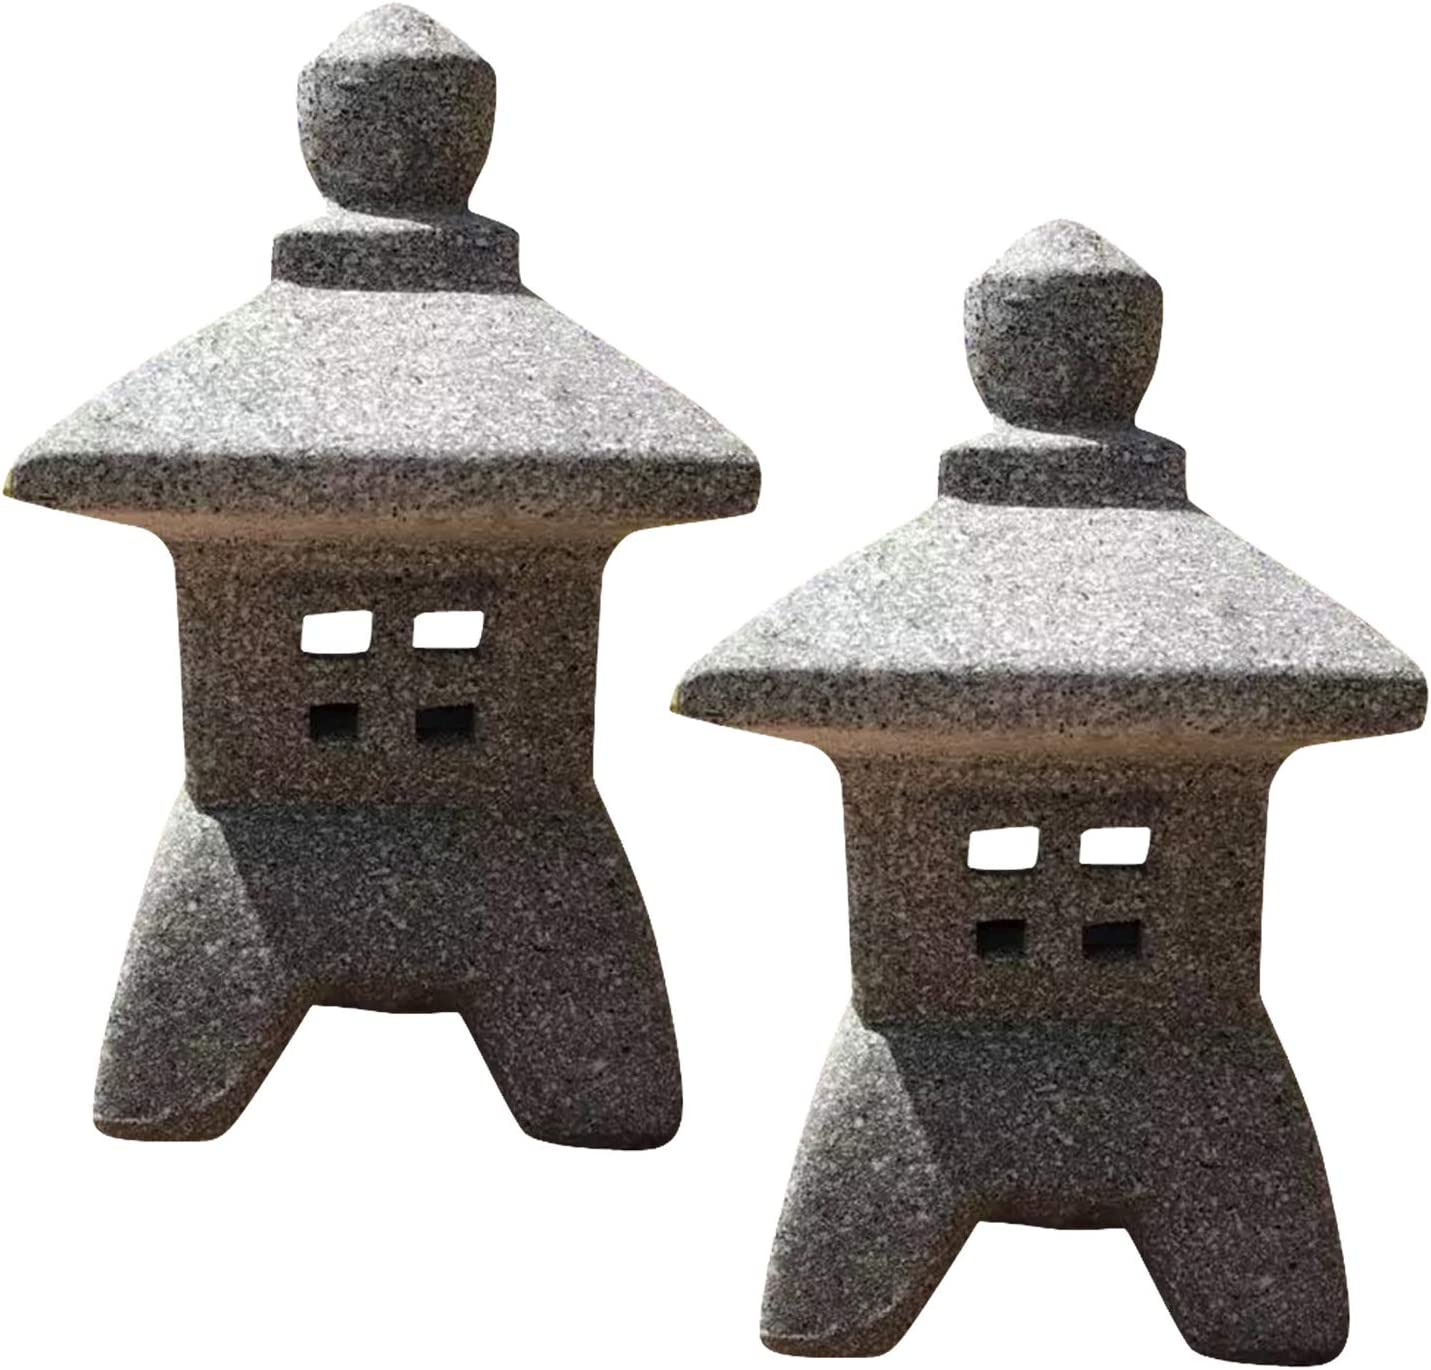 "Zen Garden Decor - Japanese Lantern - 4.53"" x 4.13"" x 7.48"" Pagoda Stone Decor w/ Fixed Roof - Japanese Garden Sculptures & Statues - Fairy Garden Outdoor Light - Candle Holder Patio Decor - 2 Pack"